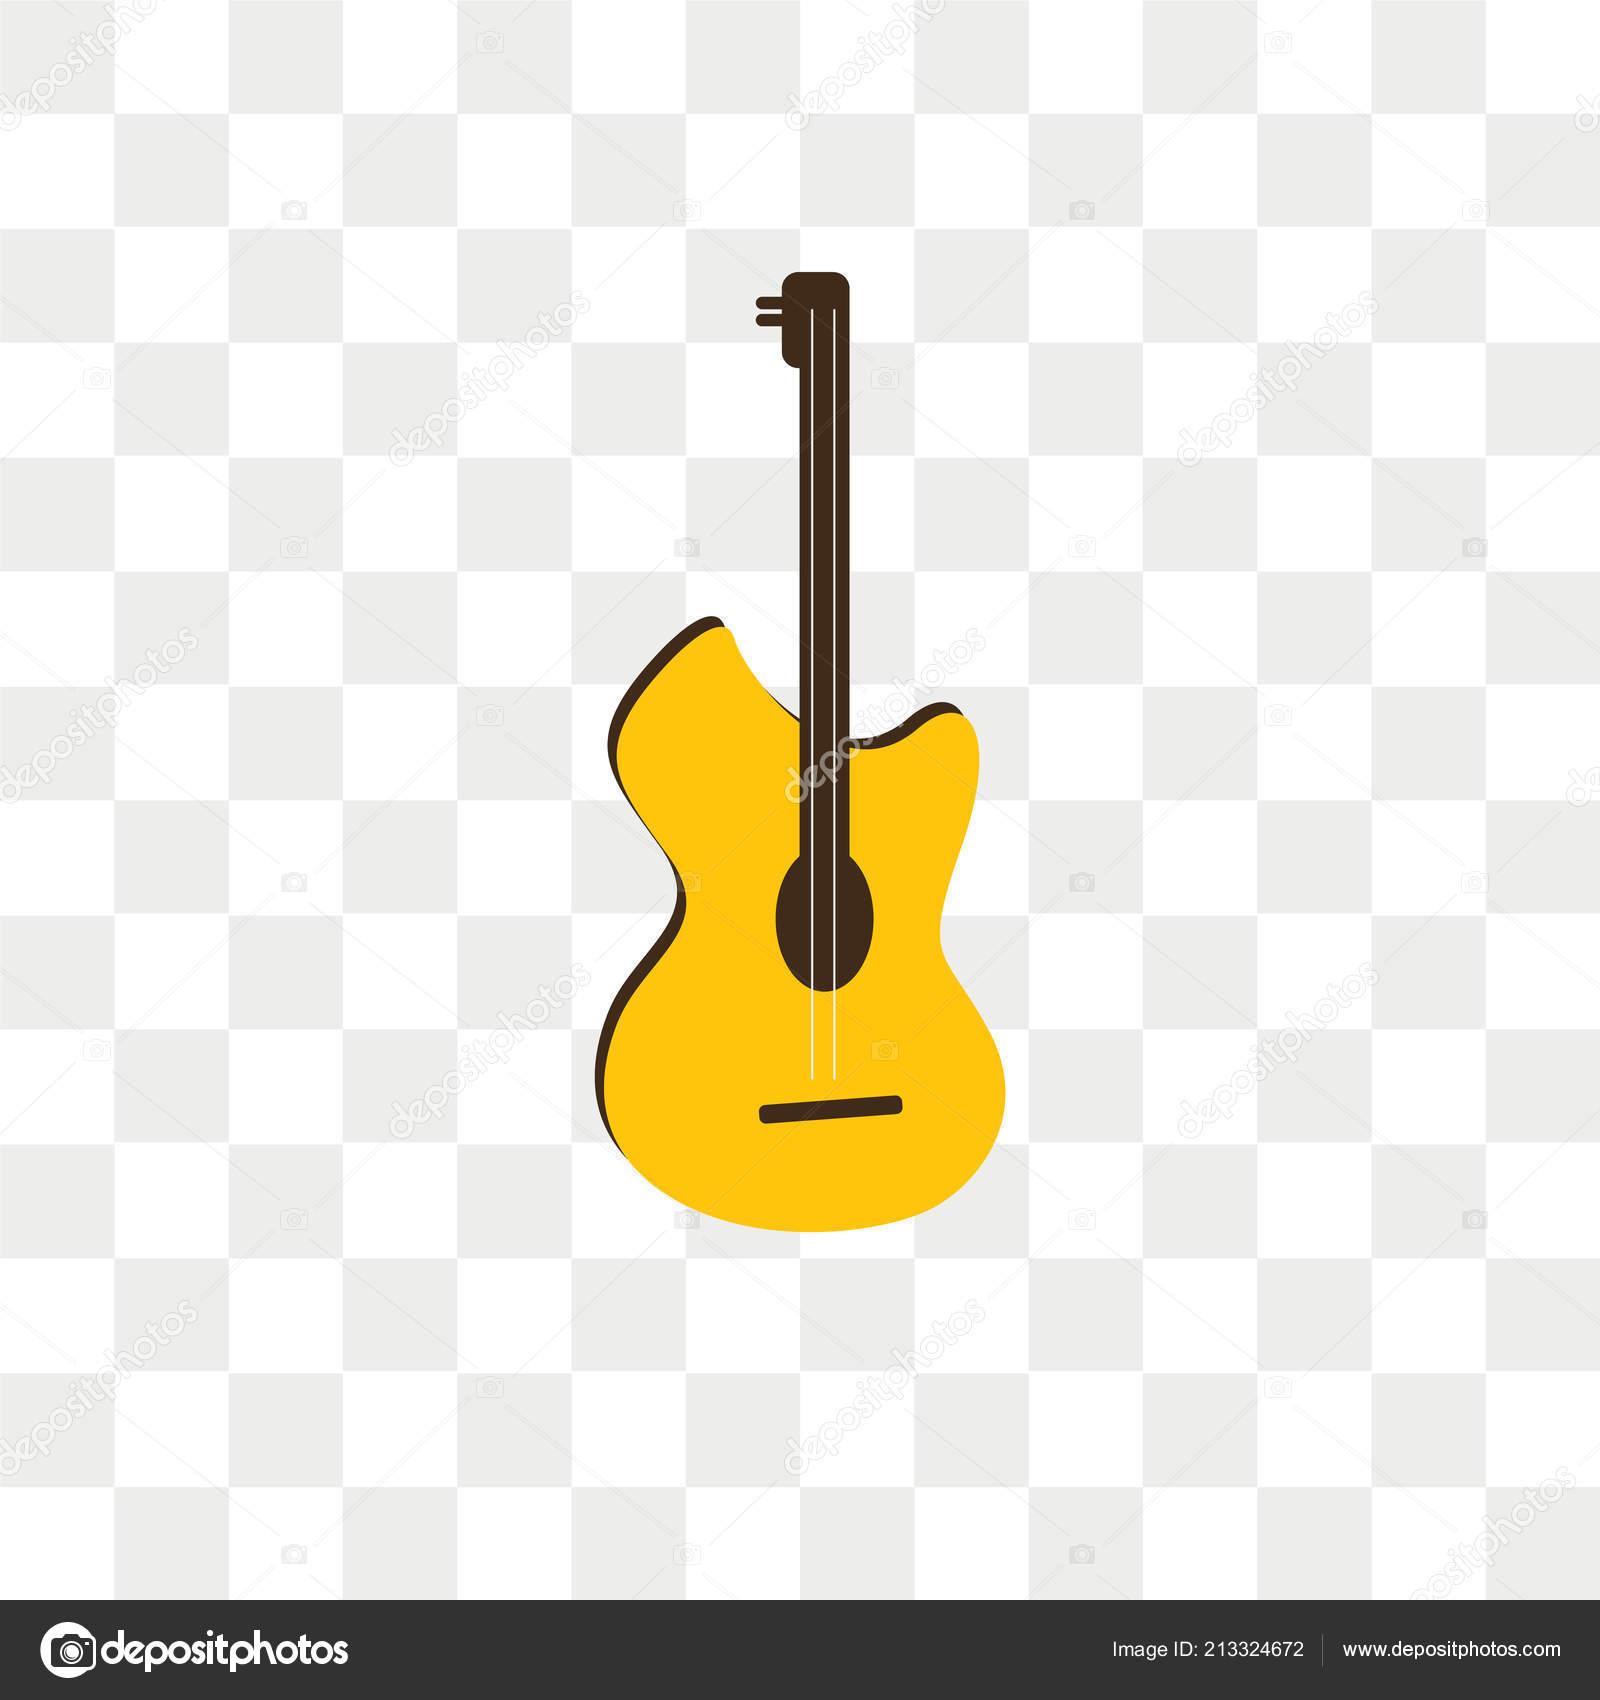 Background Bass Guitar Transparent Bass Guitar Vector Icon Isolated On Transparent Background Bass Stock Vector C Vectorstockcompany 213324672